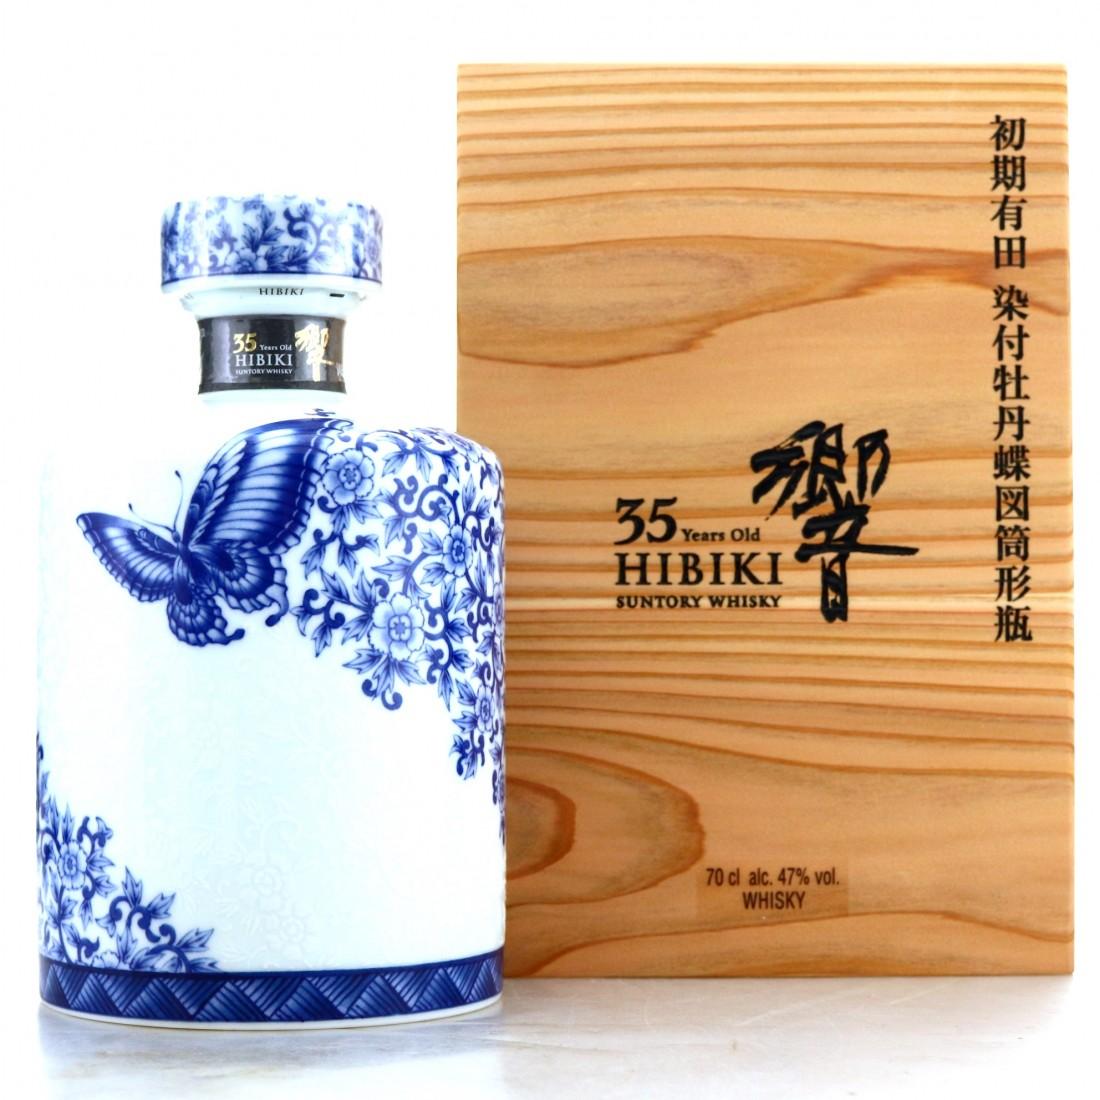 Hibiki 35 Year Old Kutani Decanter